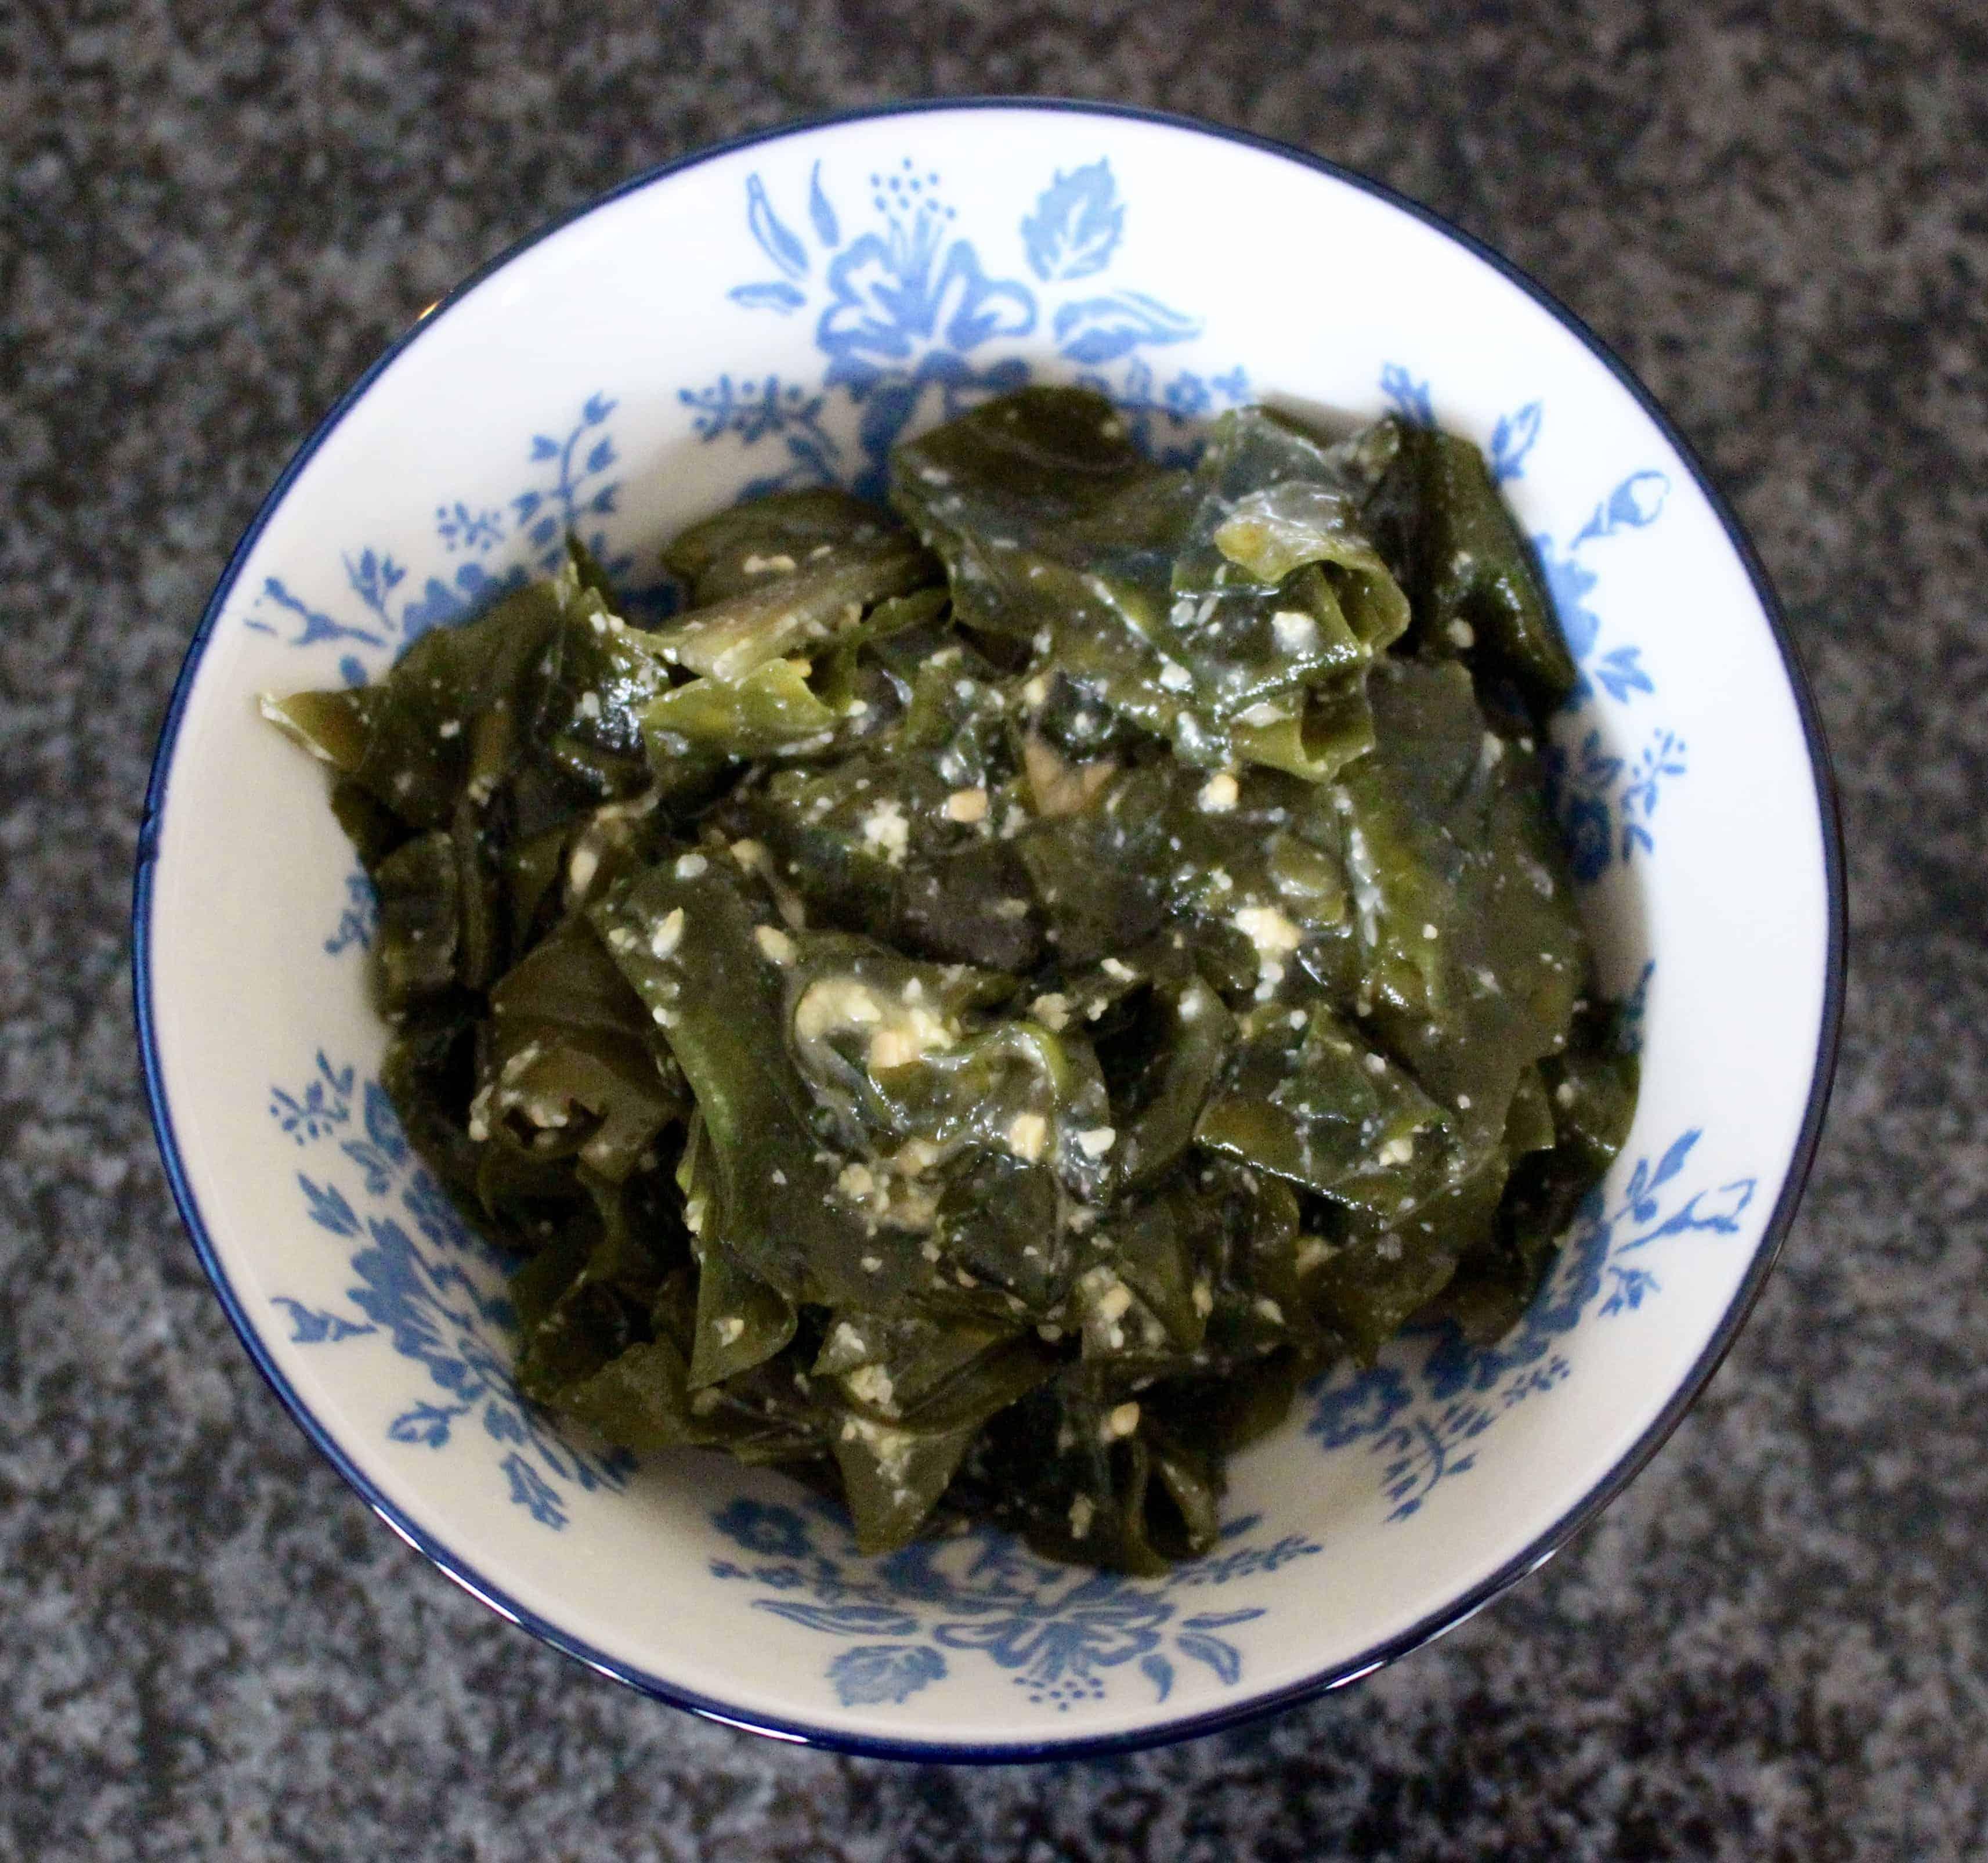 Miso Seaweed Salad (Vegan + GF)